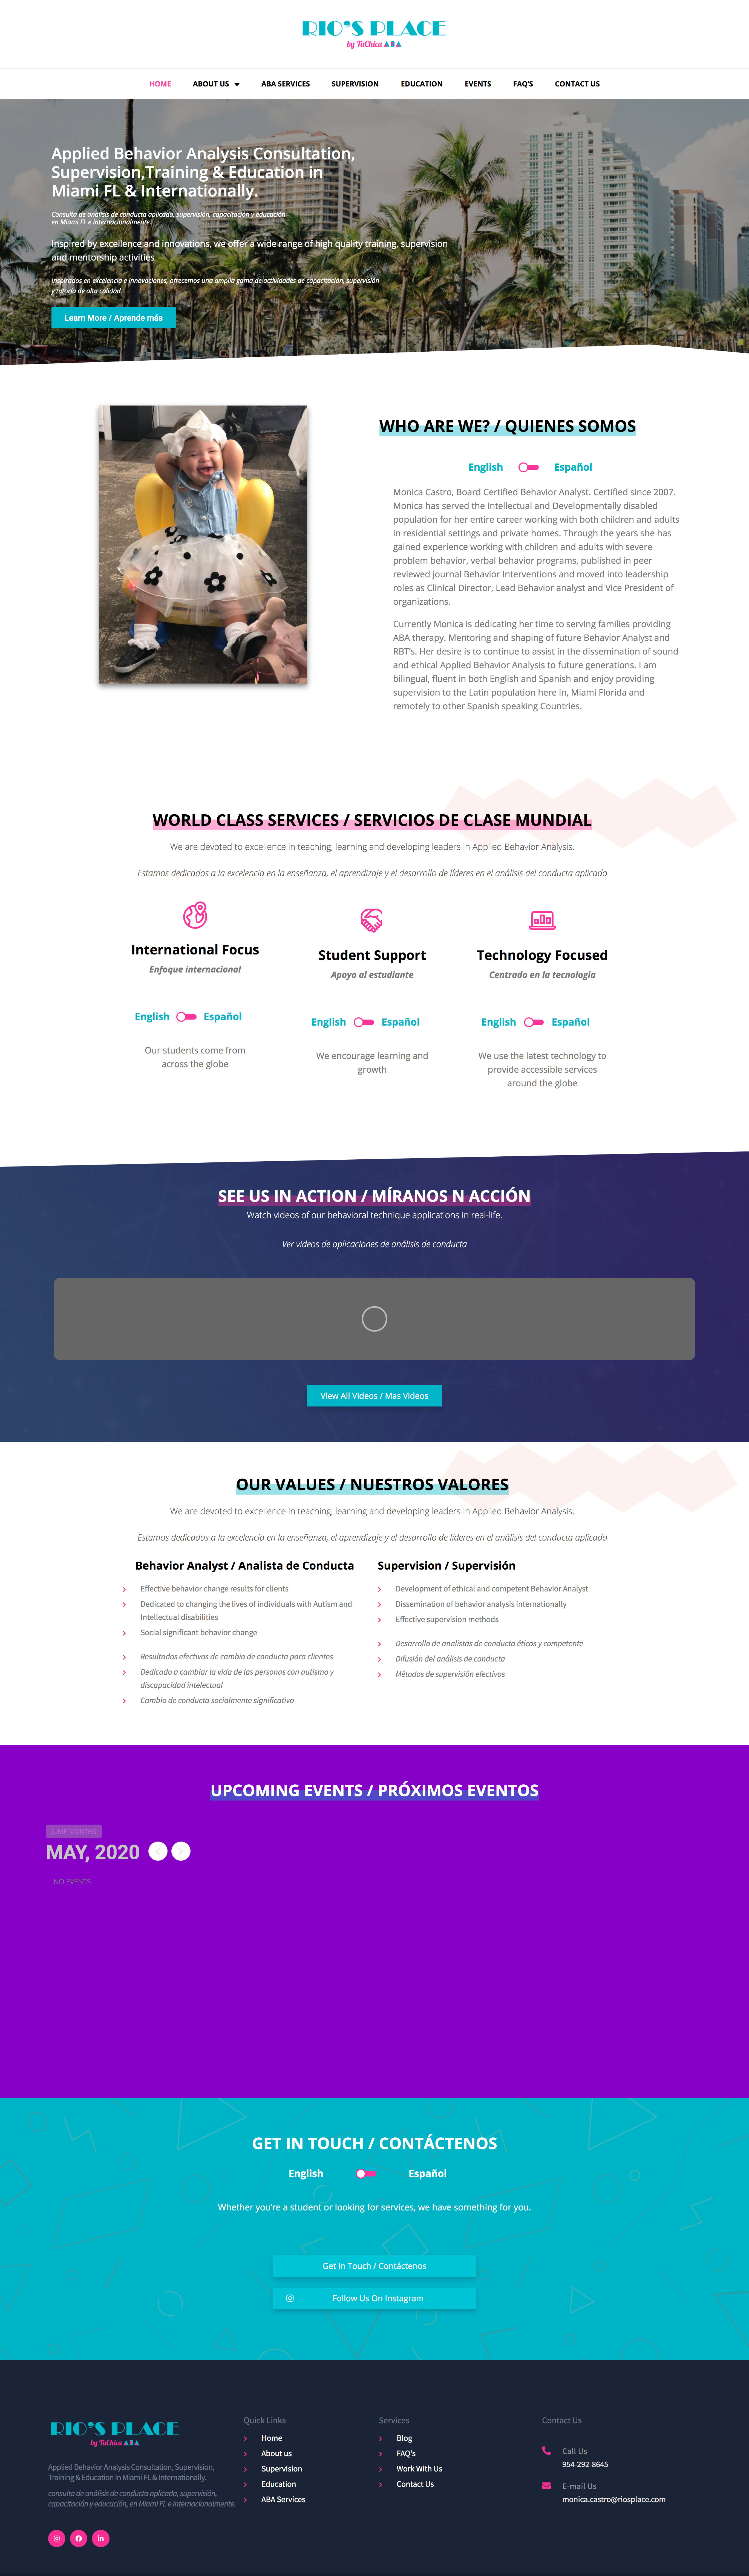 Aba Services Website Design In 2020 Marketing Agency Website Design Marketing